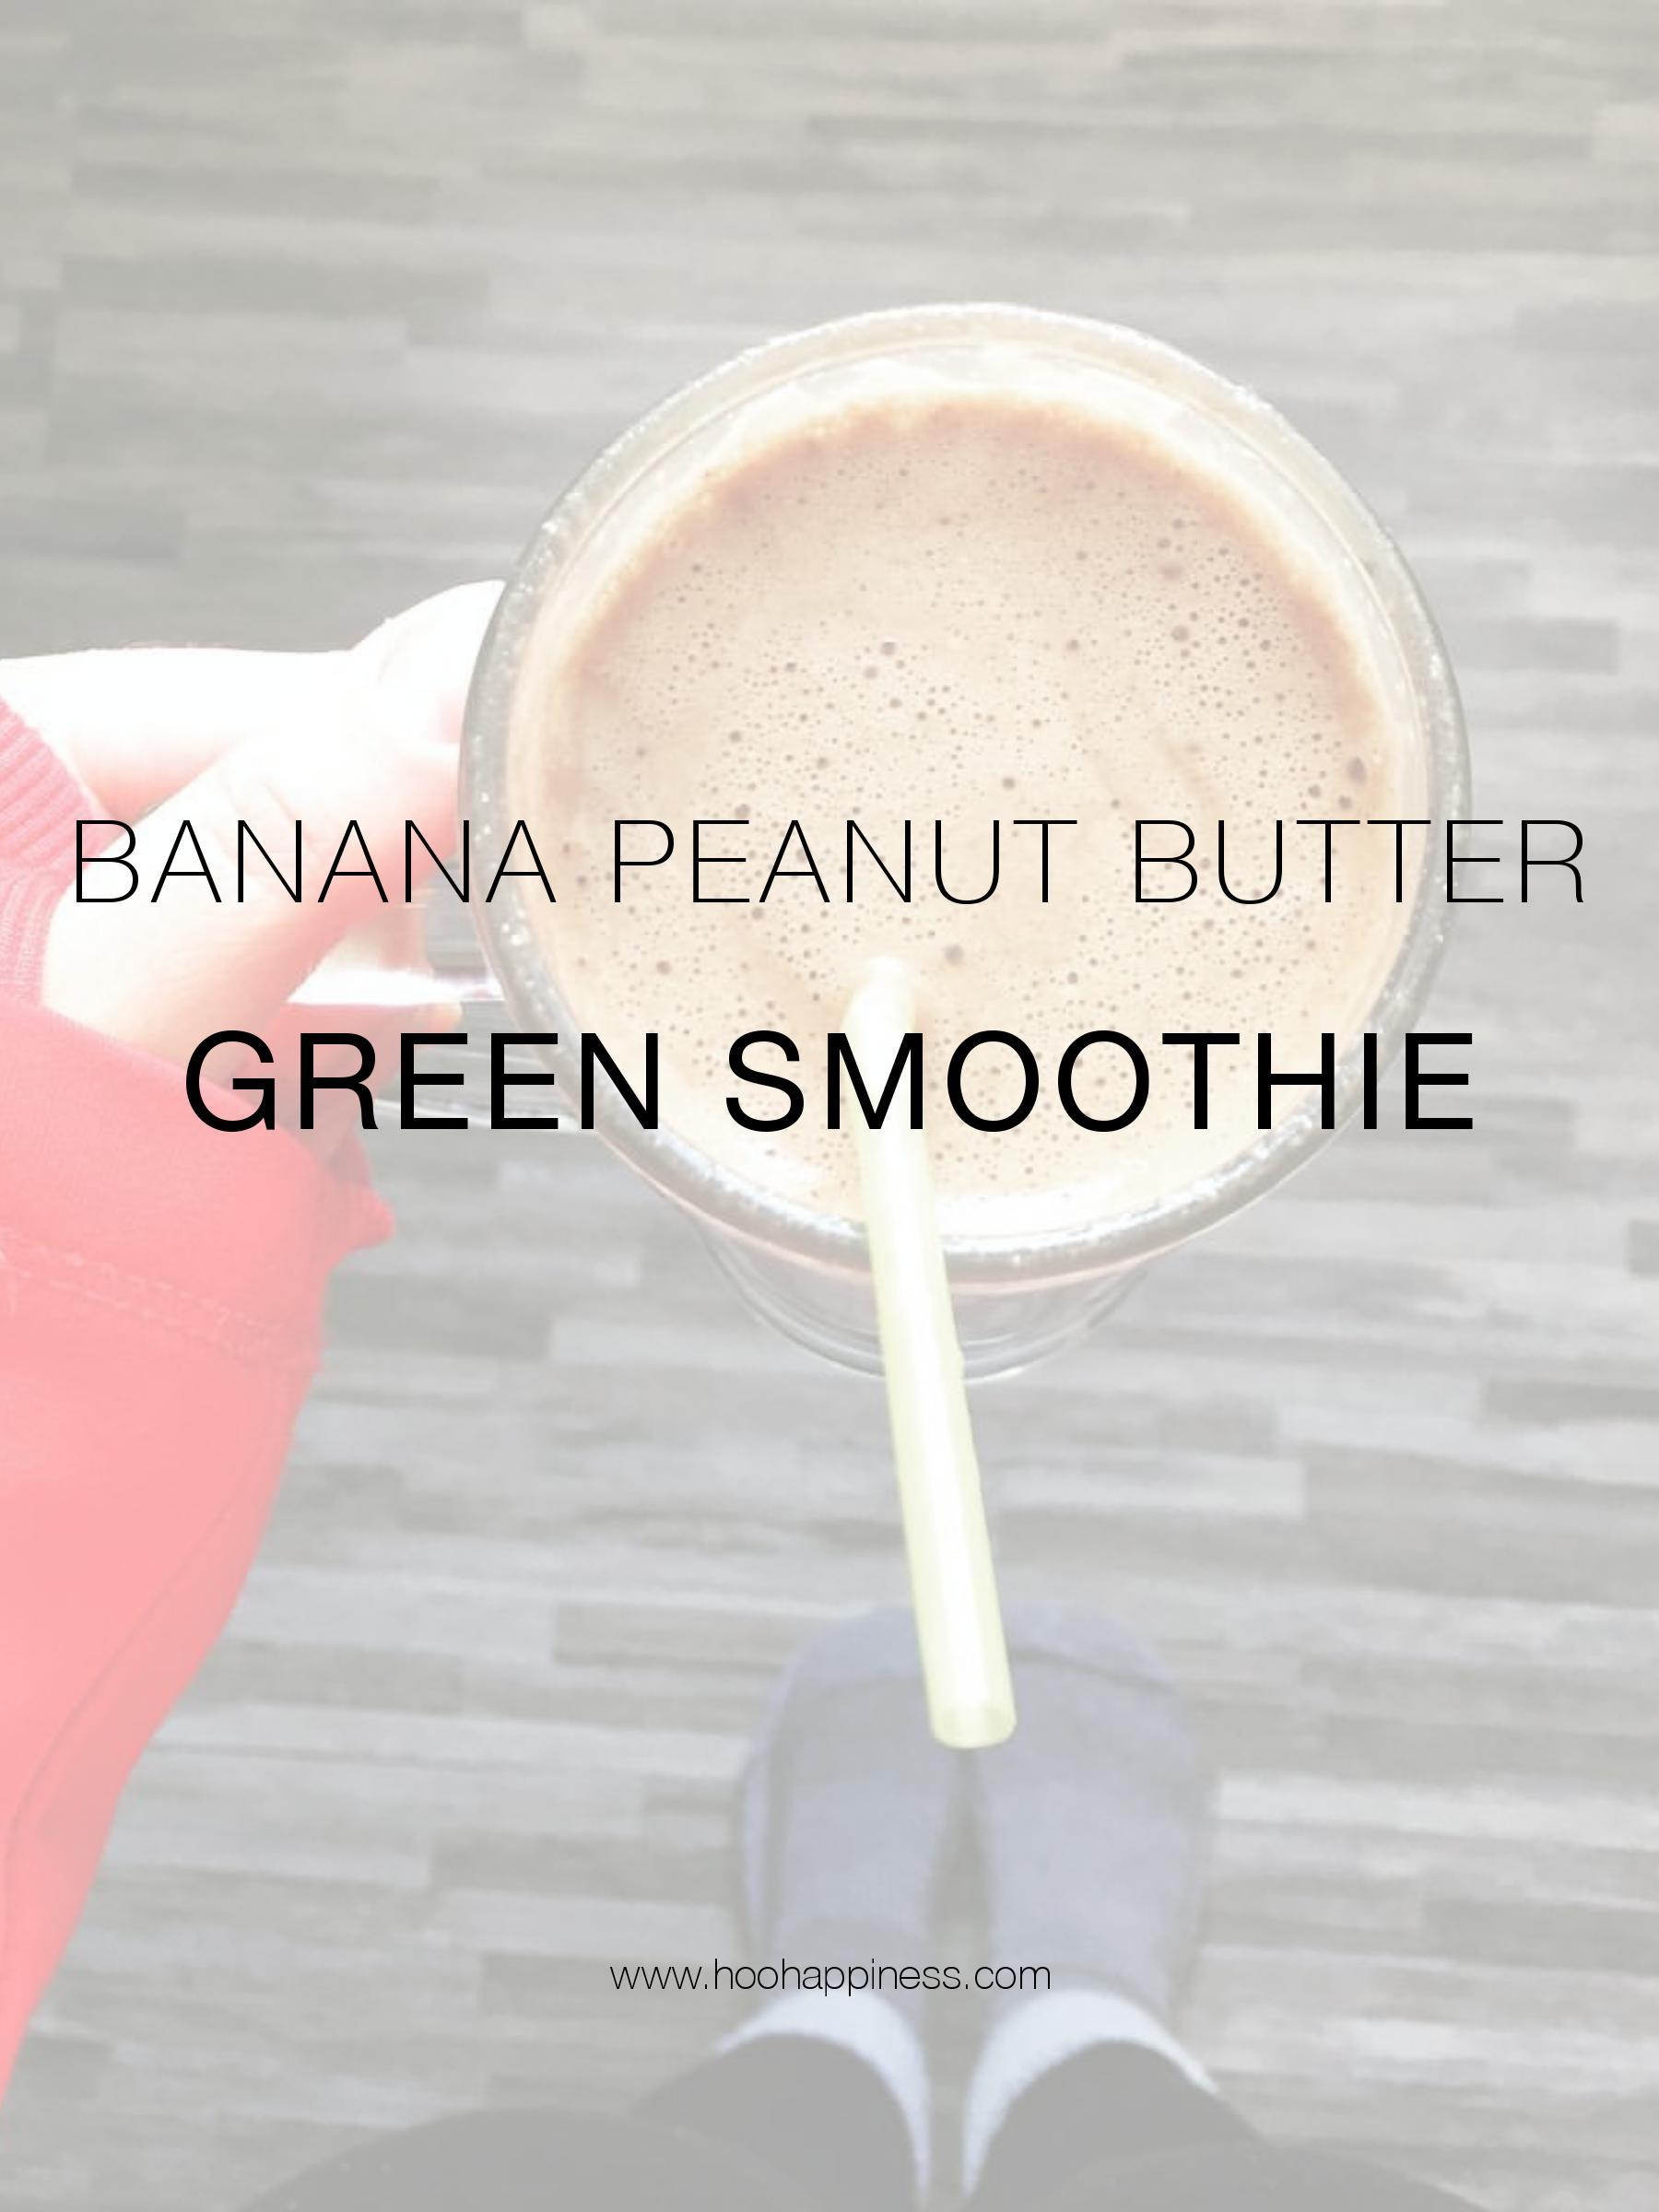 Protein + Power Packed Peanut Butter Vegan Keto Grreen Smootie HOO Happiness Blog